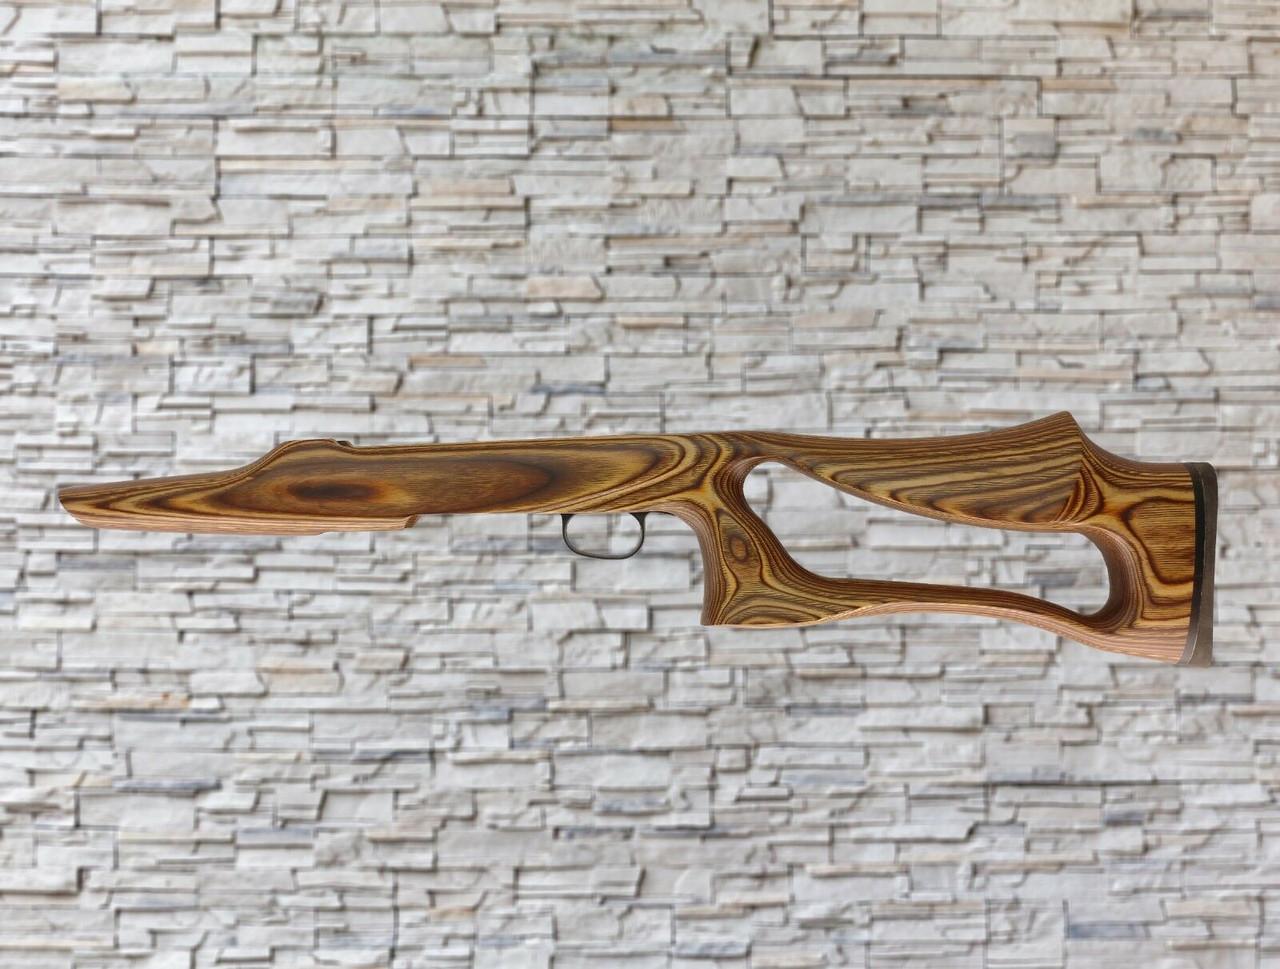 Boyds SS Evolution Nutmeg Wood Stock for Savage 62/64 Rifles